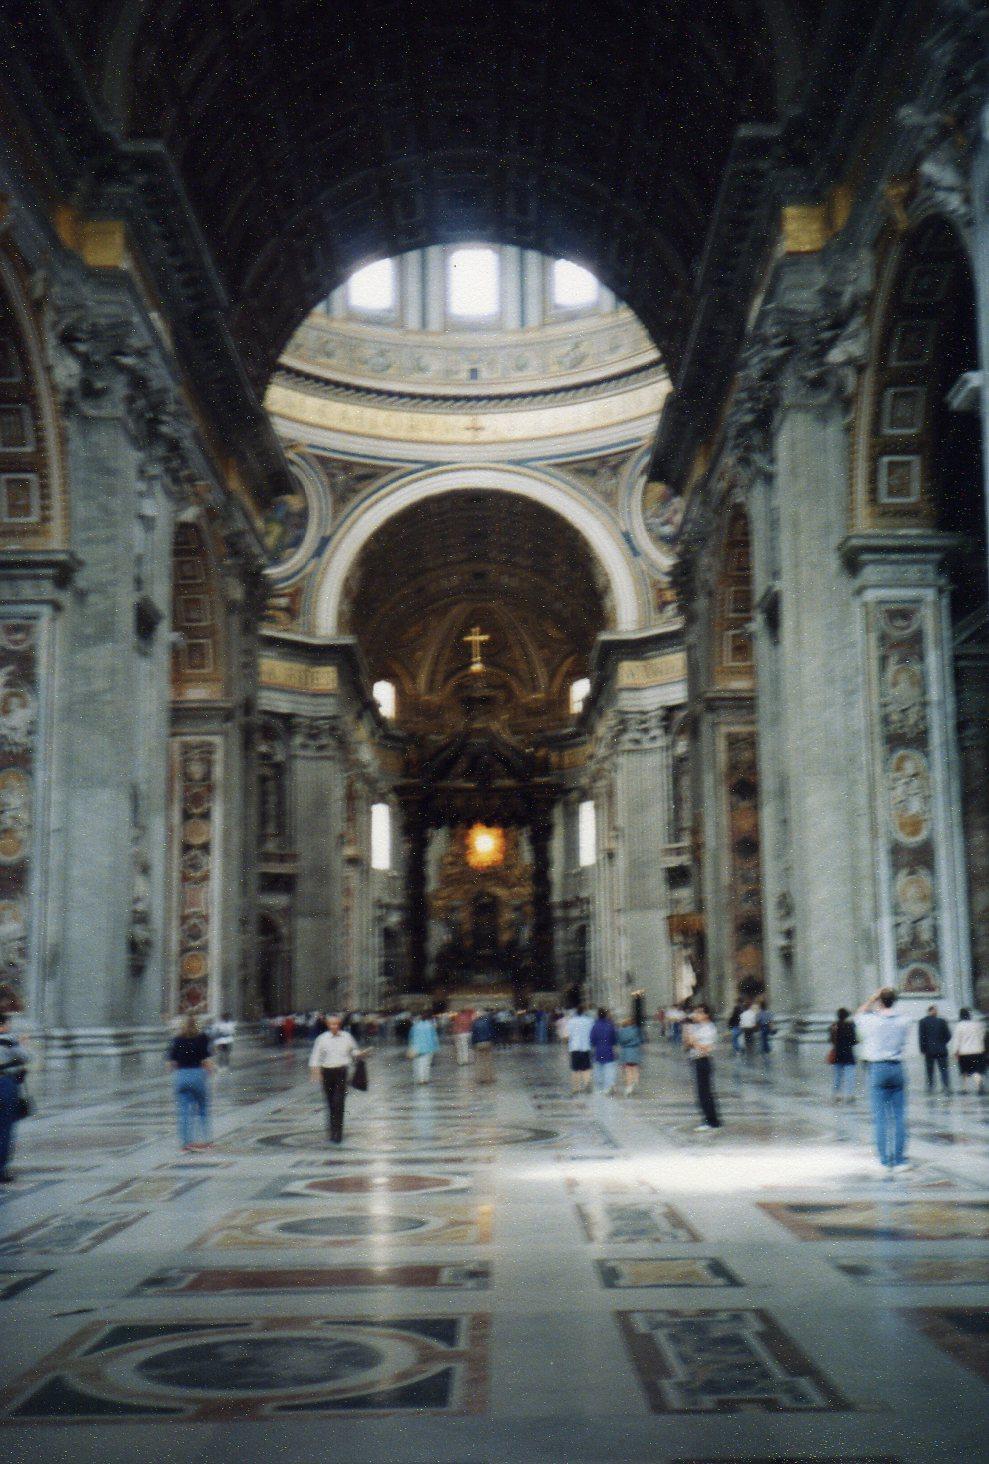 Inside St Peter's Basilica -